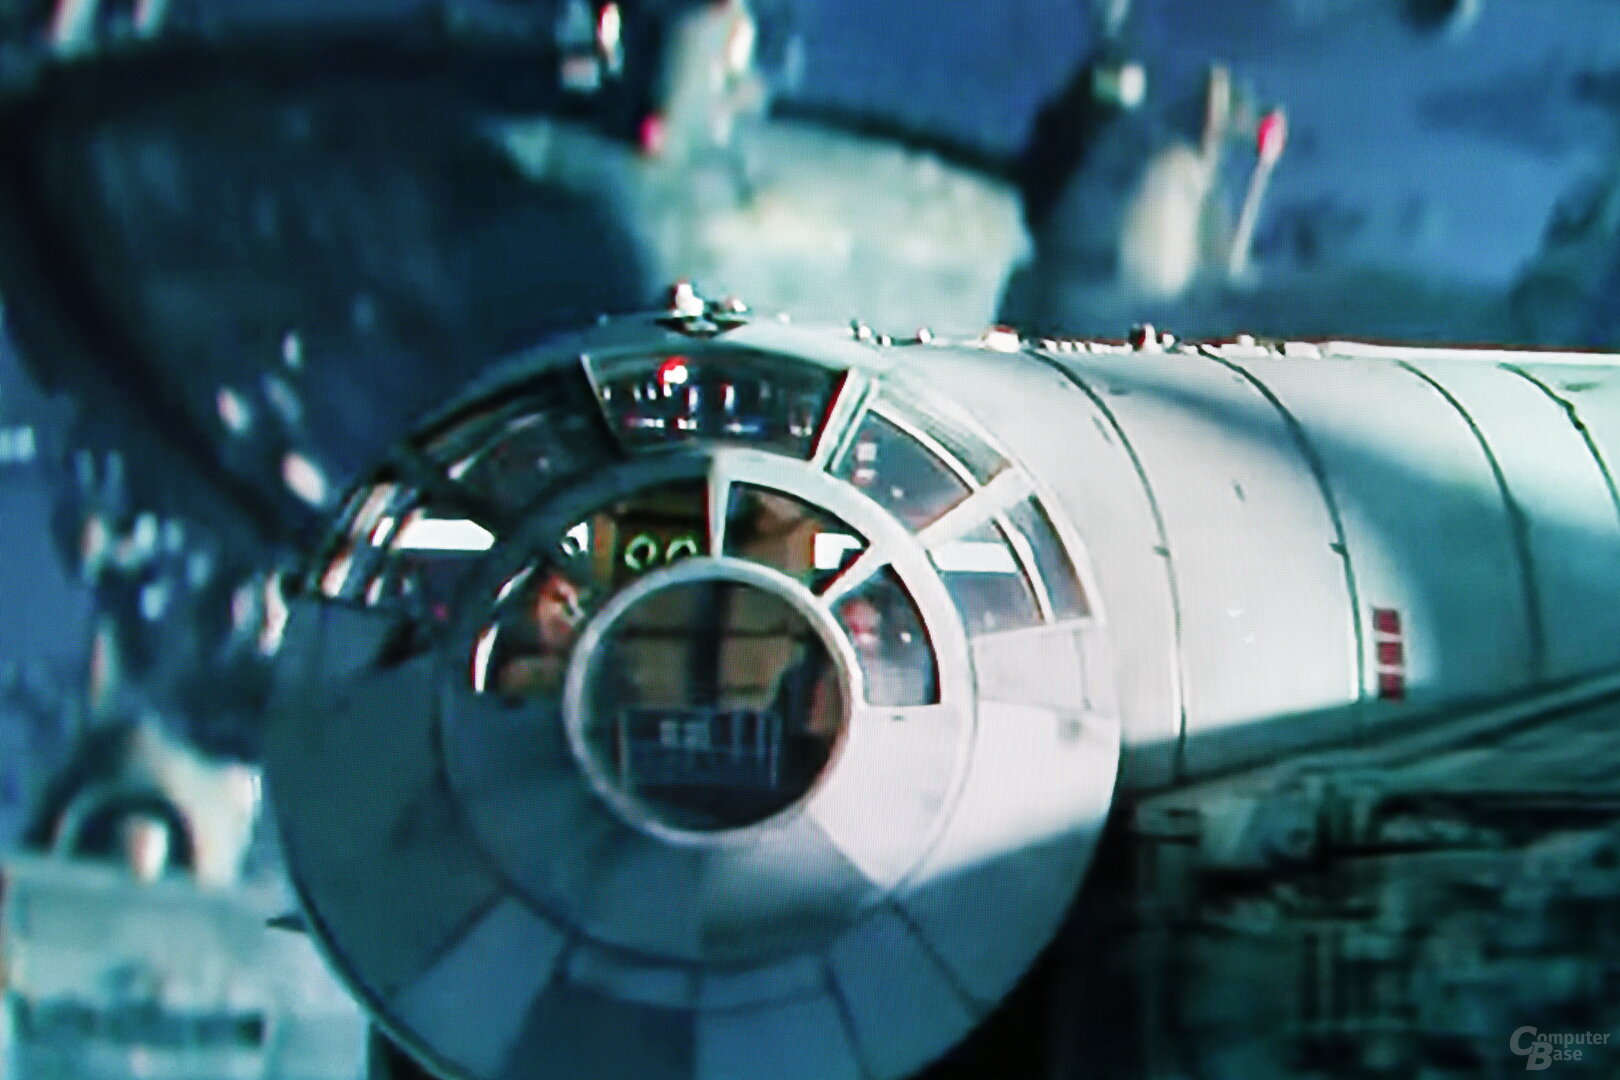 Szene aus Star Wars IX Trailer: KI-Upscaling